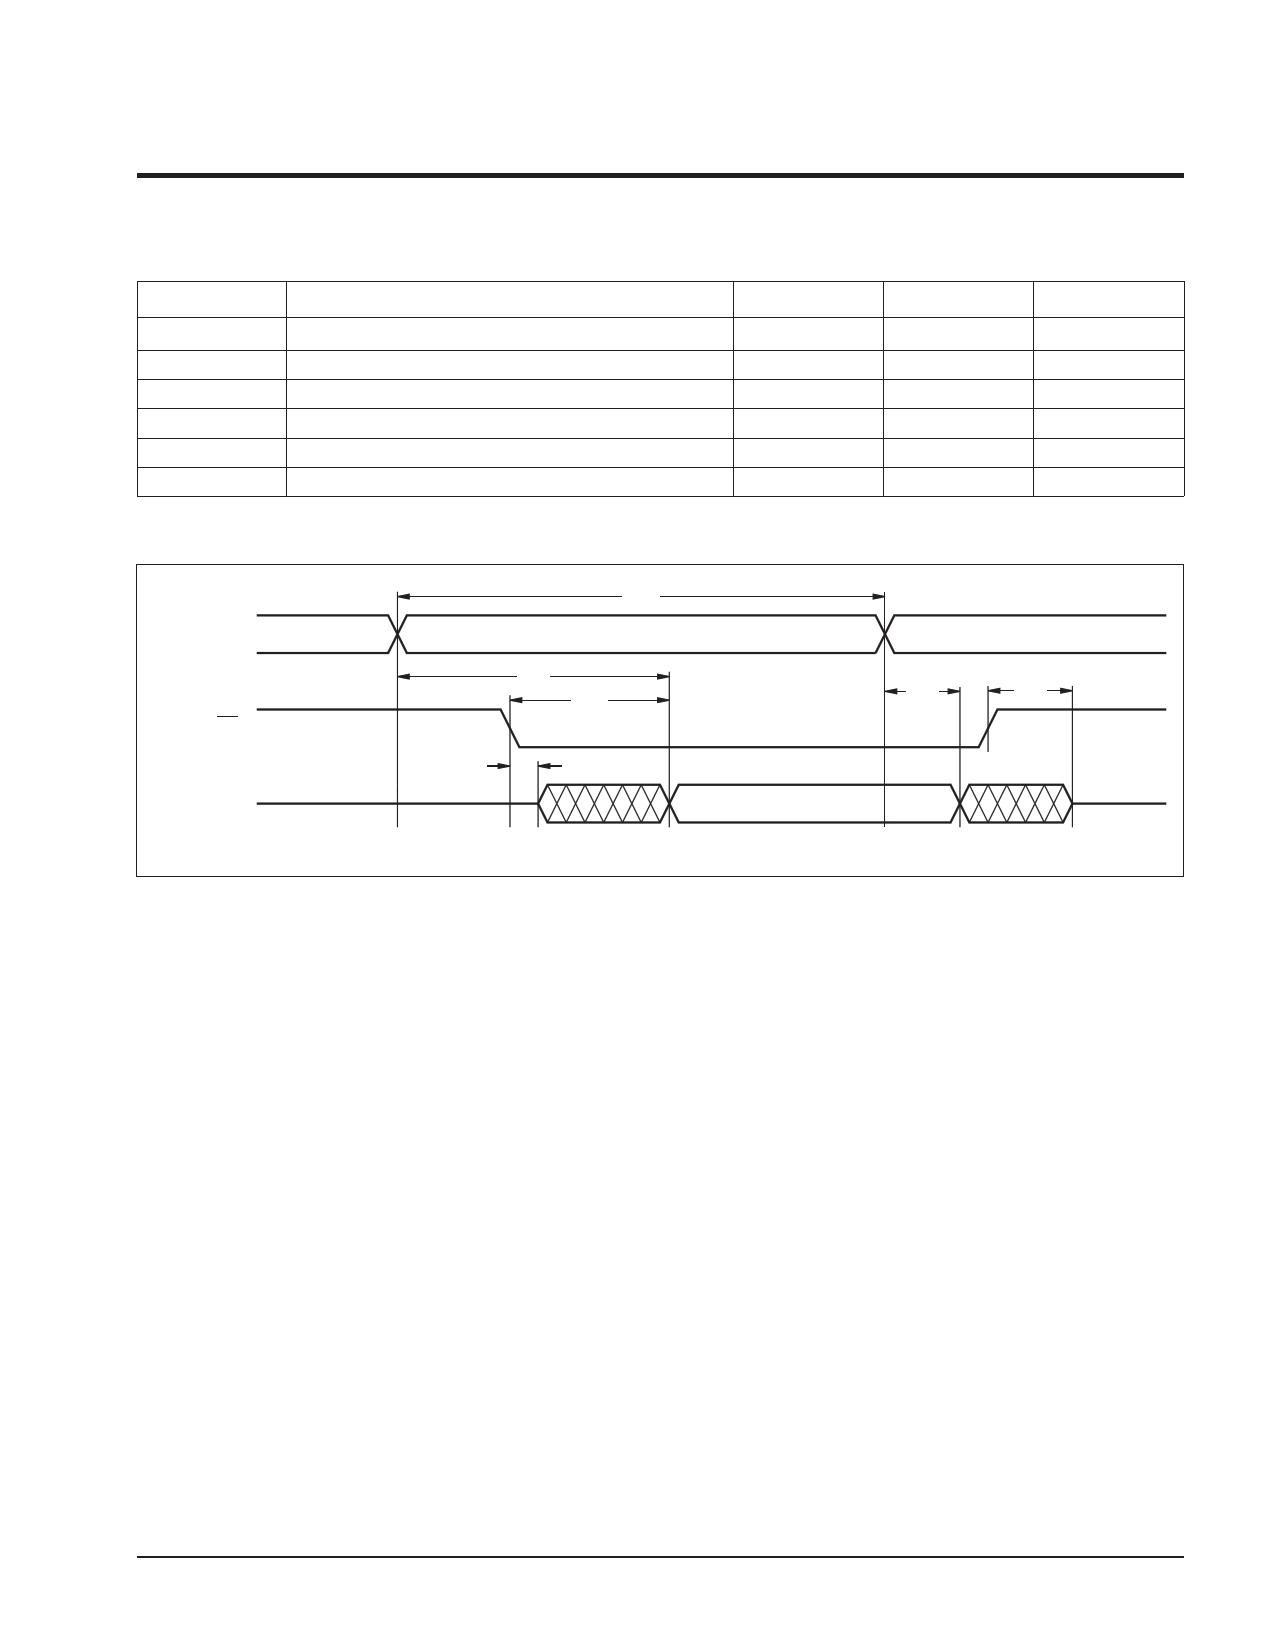 static ram and dynamic ram pdf